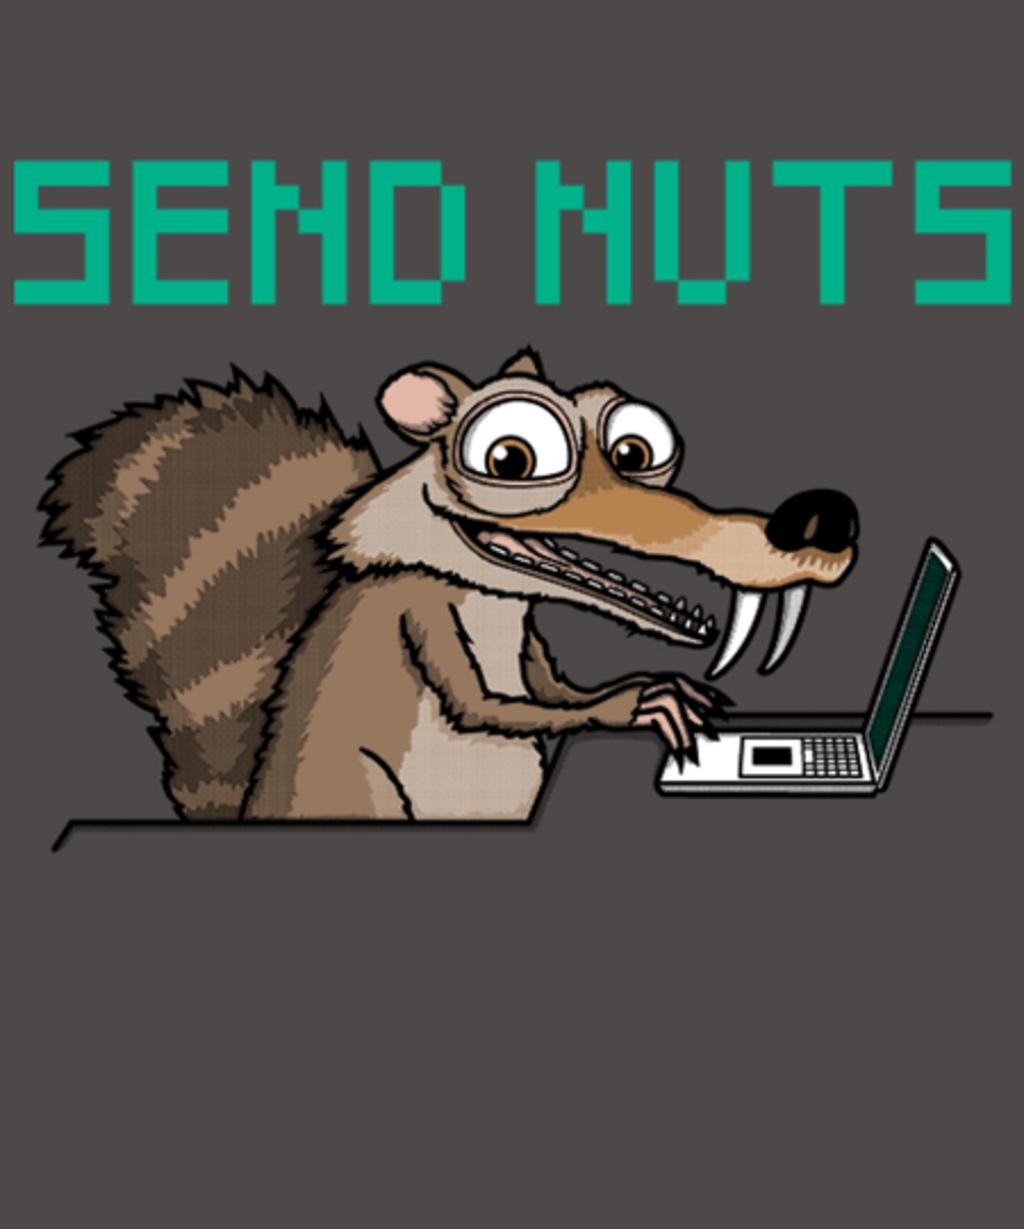 Qwertee: Send Nuts!